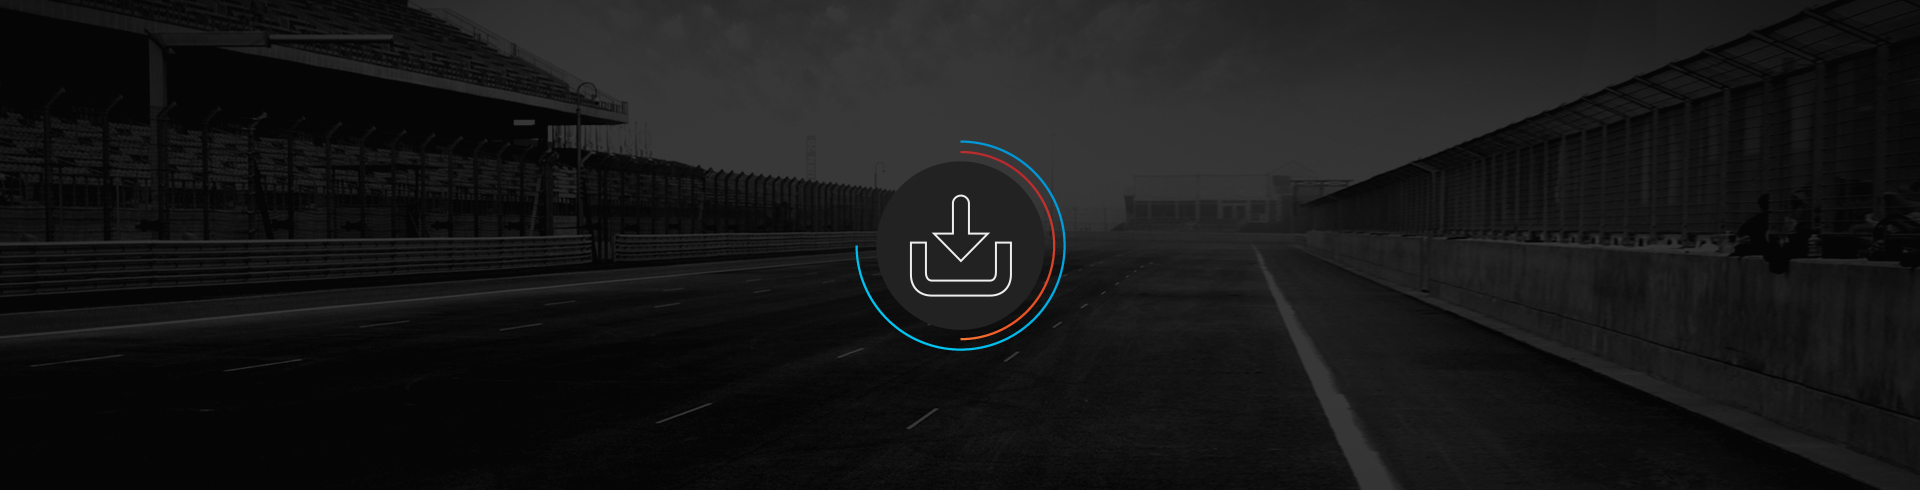 Download - X - Performance Development